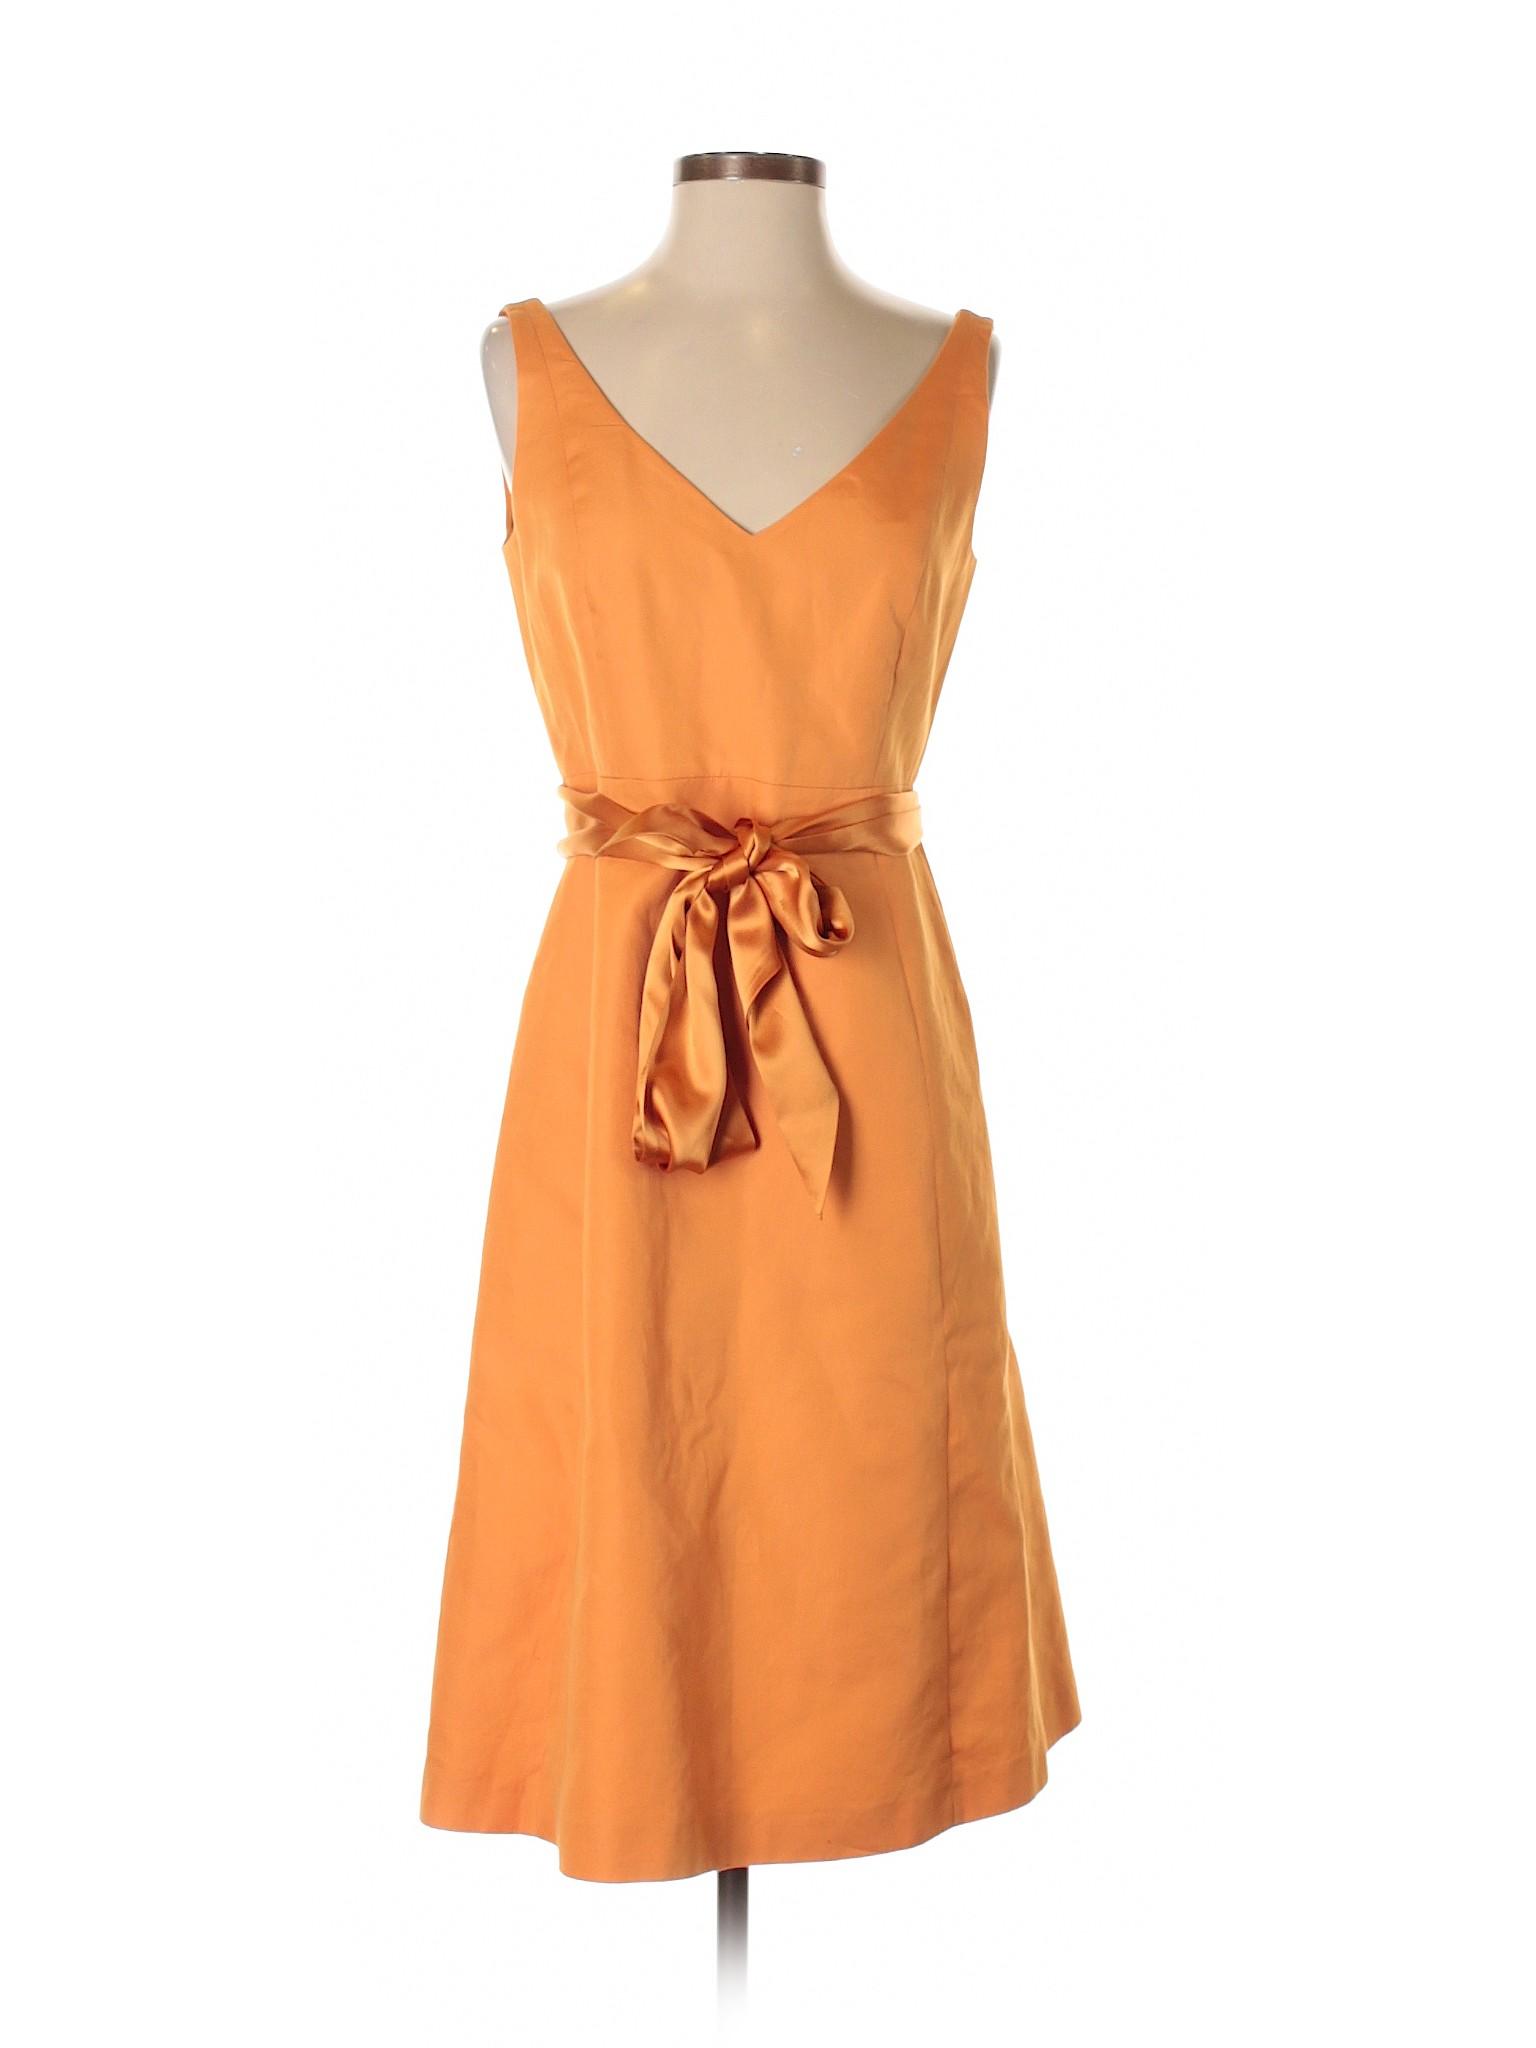 Crew Selling Dress Dress Casual J Crew Crew Casual Selling J Selling J ZwUdqz